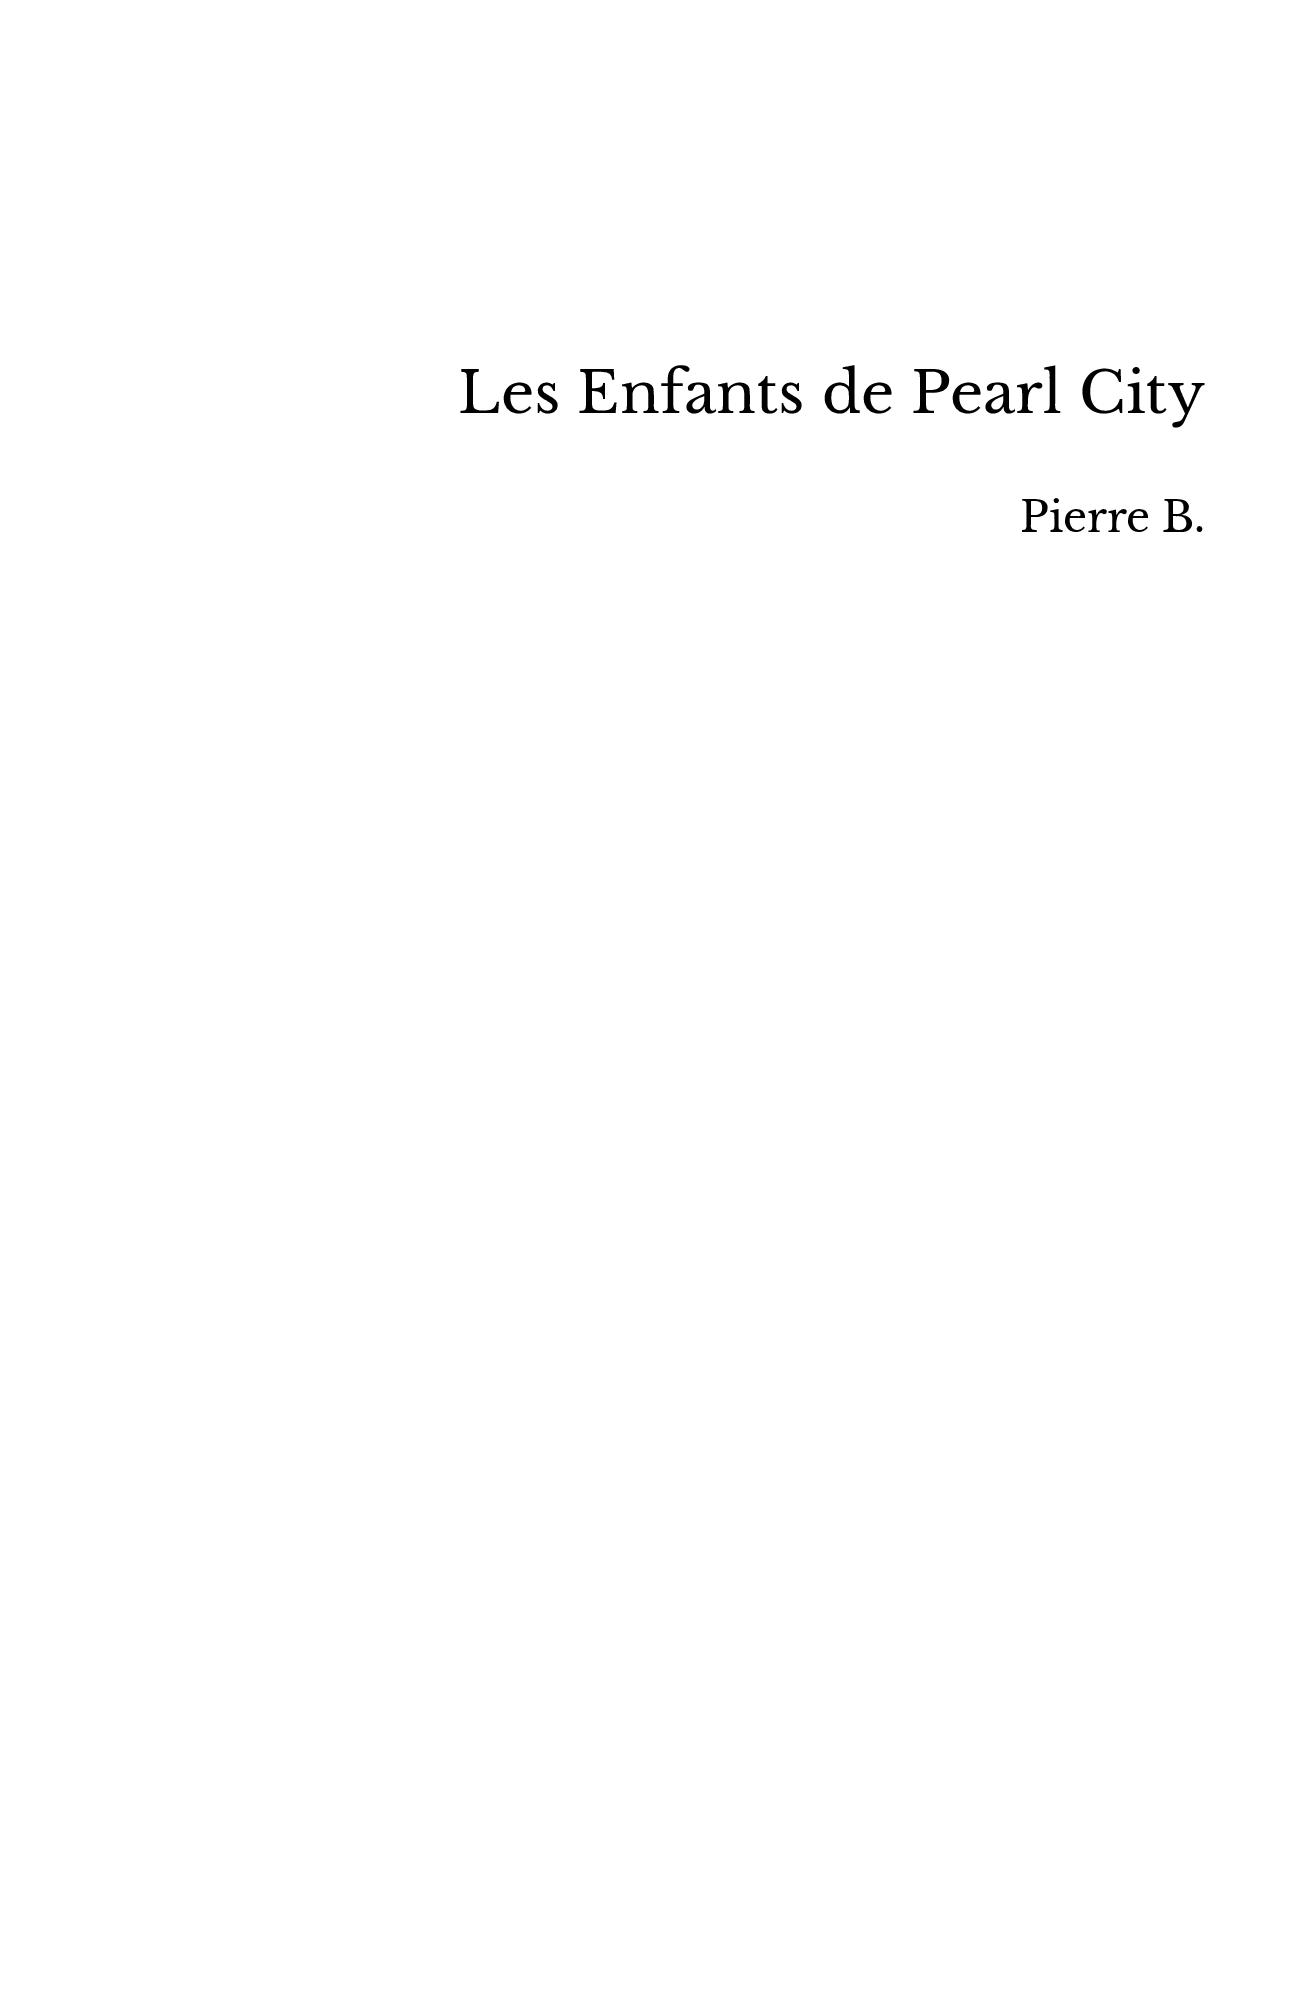 Les Enfants de Pearl City